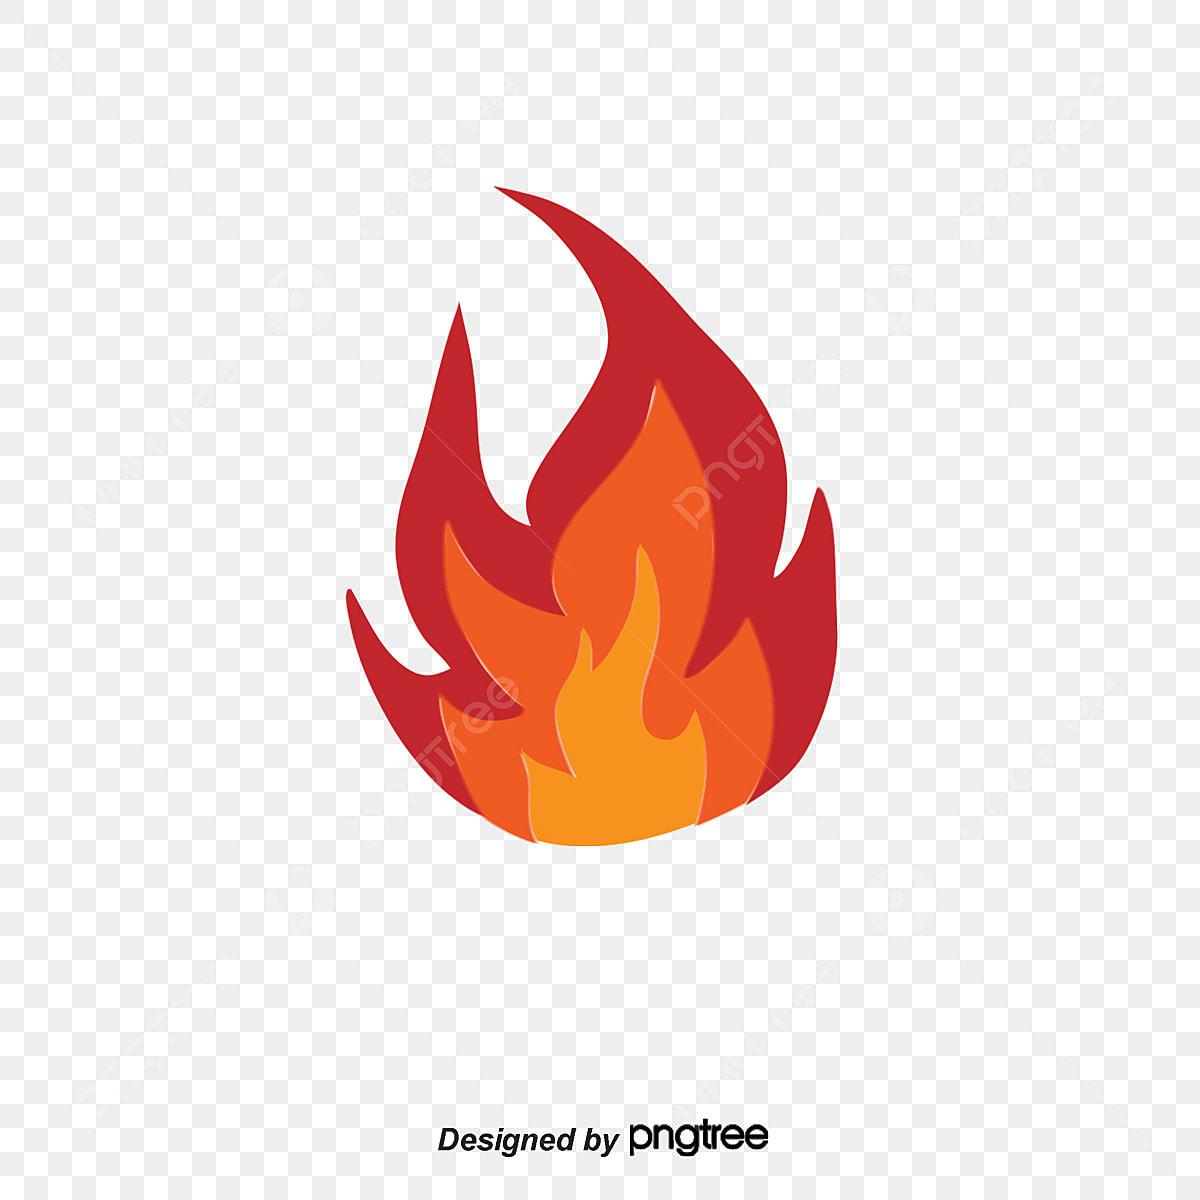 images?q=tbn:ANd9GcQh_l3eQ5xwiPy07kGEXjmjgmBKBRB7H2mRxCGhv1tFWg5c_mWT Ideas For Free Vector Flames Clipart @koolgadgetz.com.info